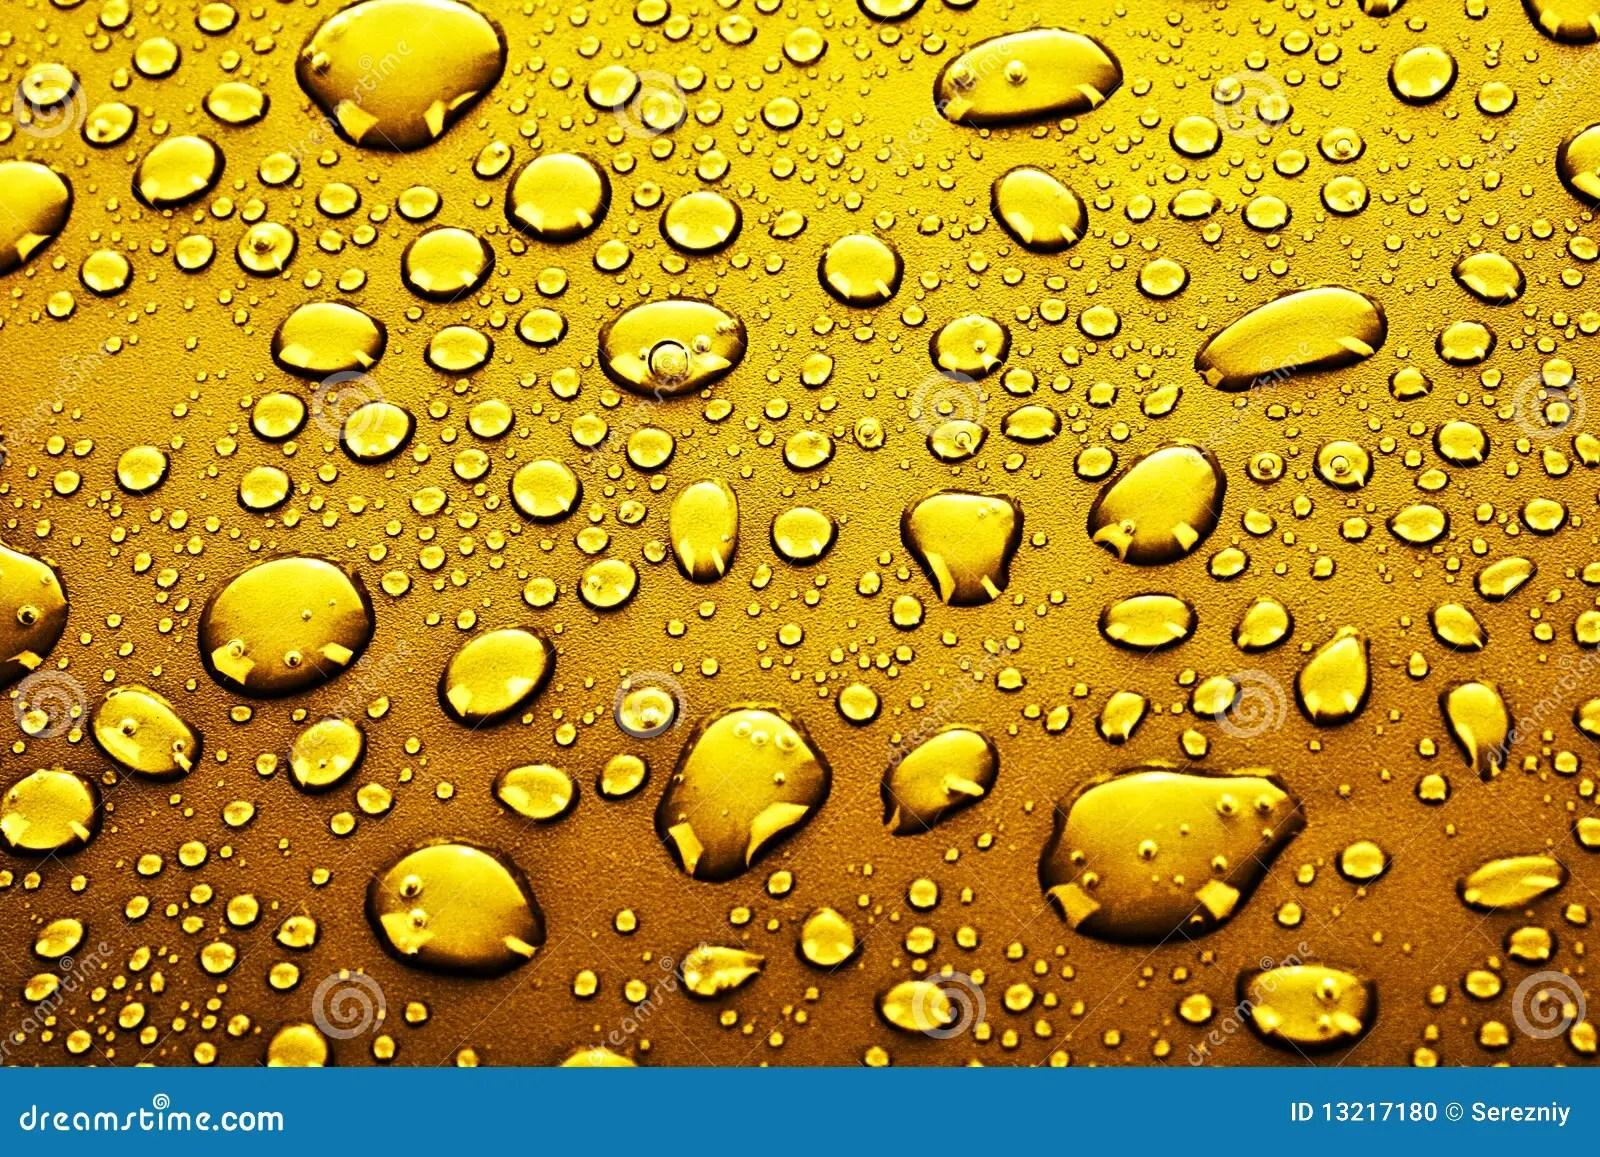 3d Liquid Abstract Wallpaper Gold Water Drops Stock Photo Image 13217180